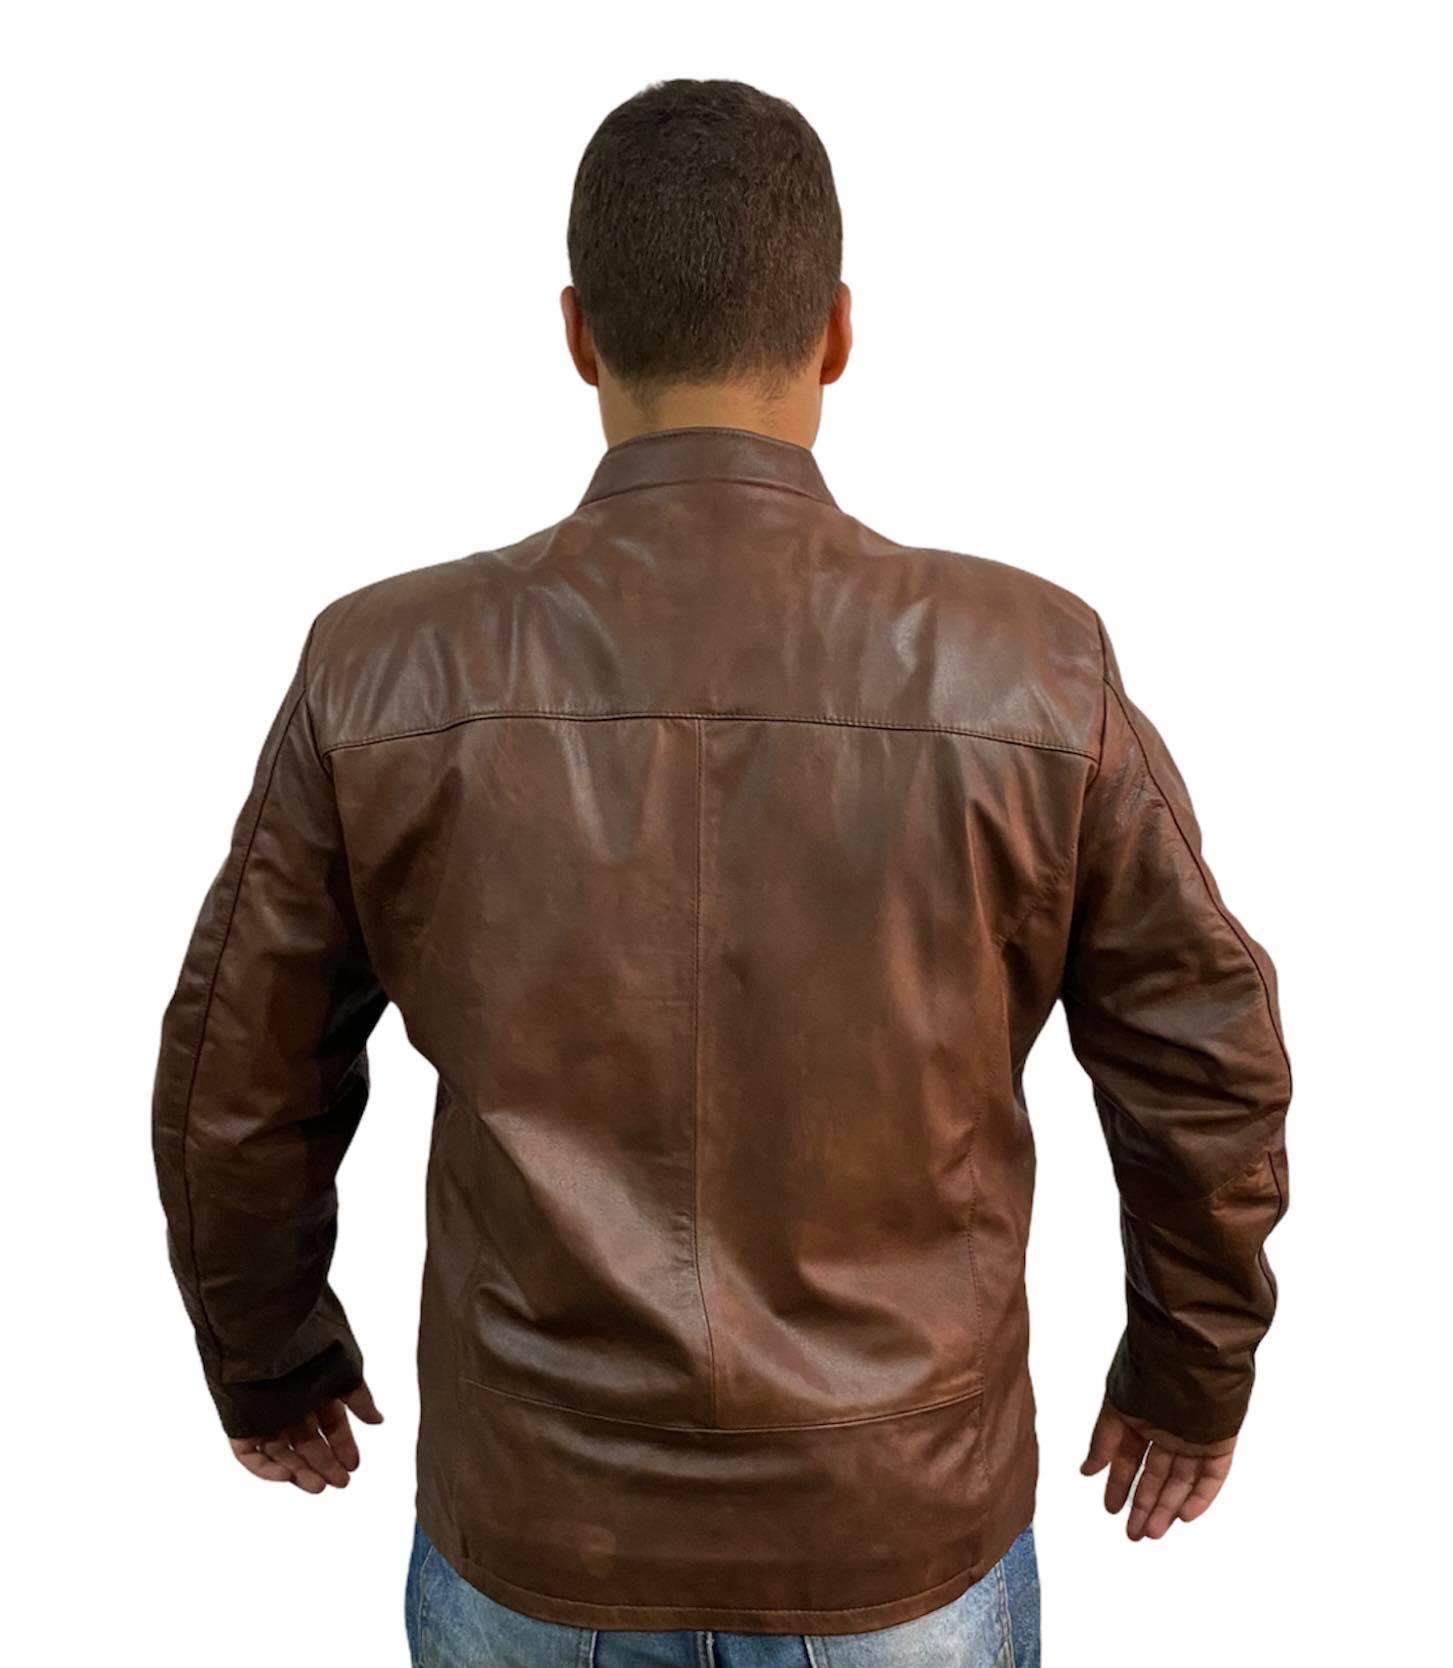 Jaqueta Caban Masculina Prata Couro 127 Ranger Manchada Plus Size